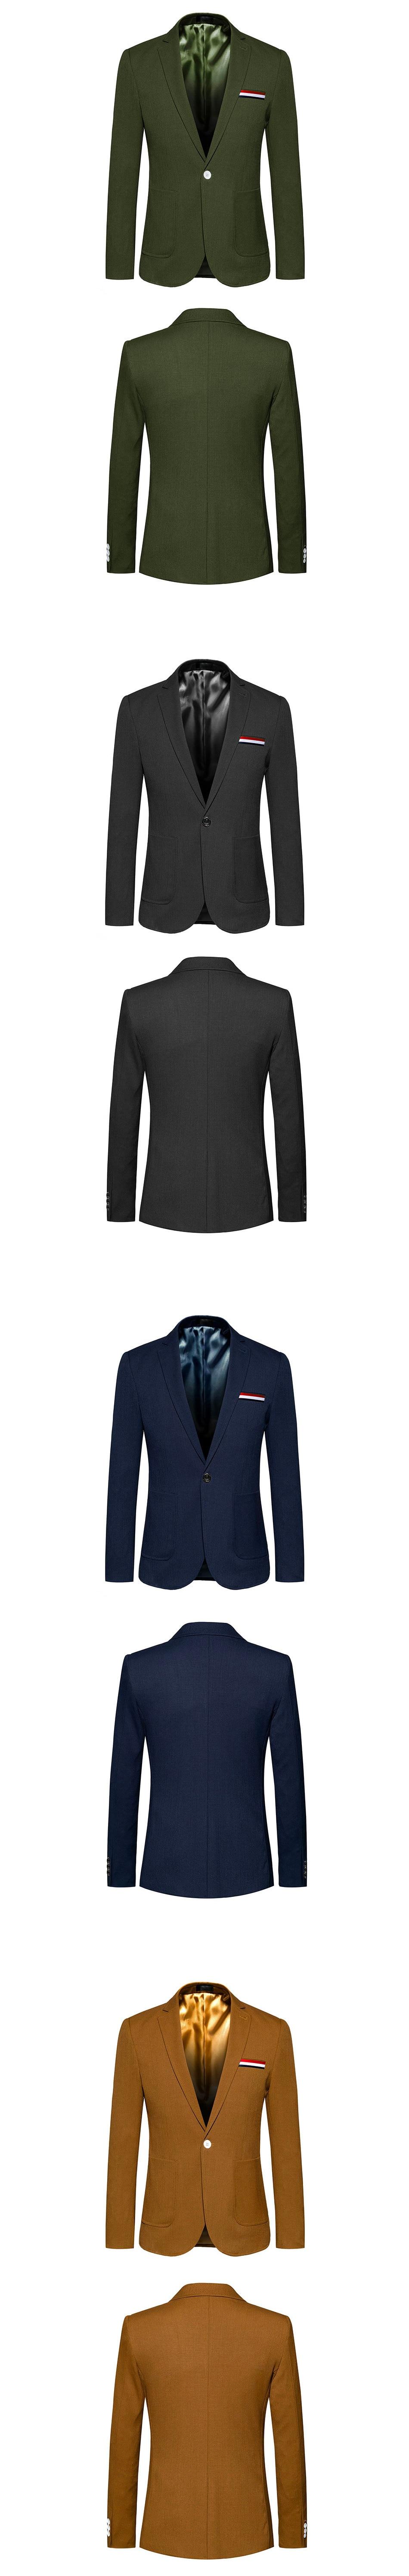 ab05af58489 Men Causal Blazers One Button High Quality Jackets Big Size 5XL 6XL ...